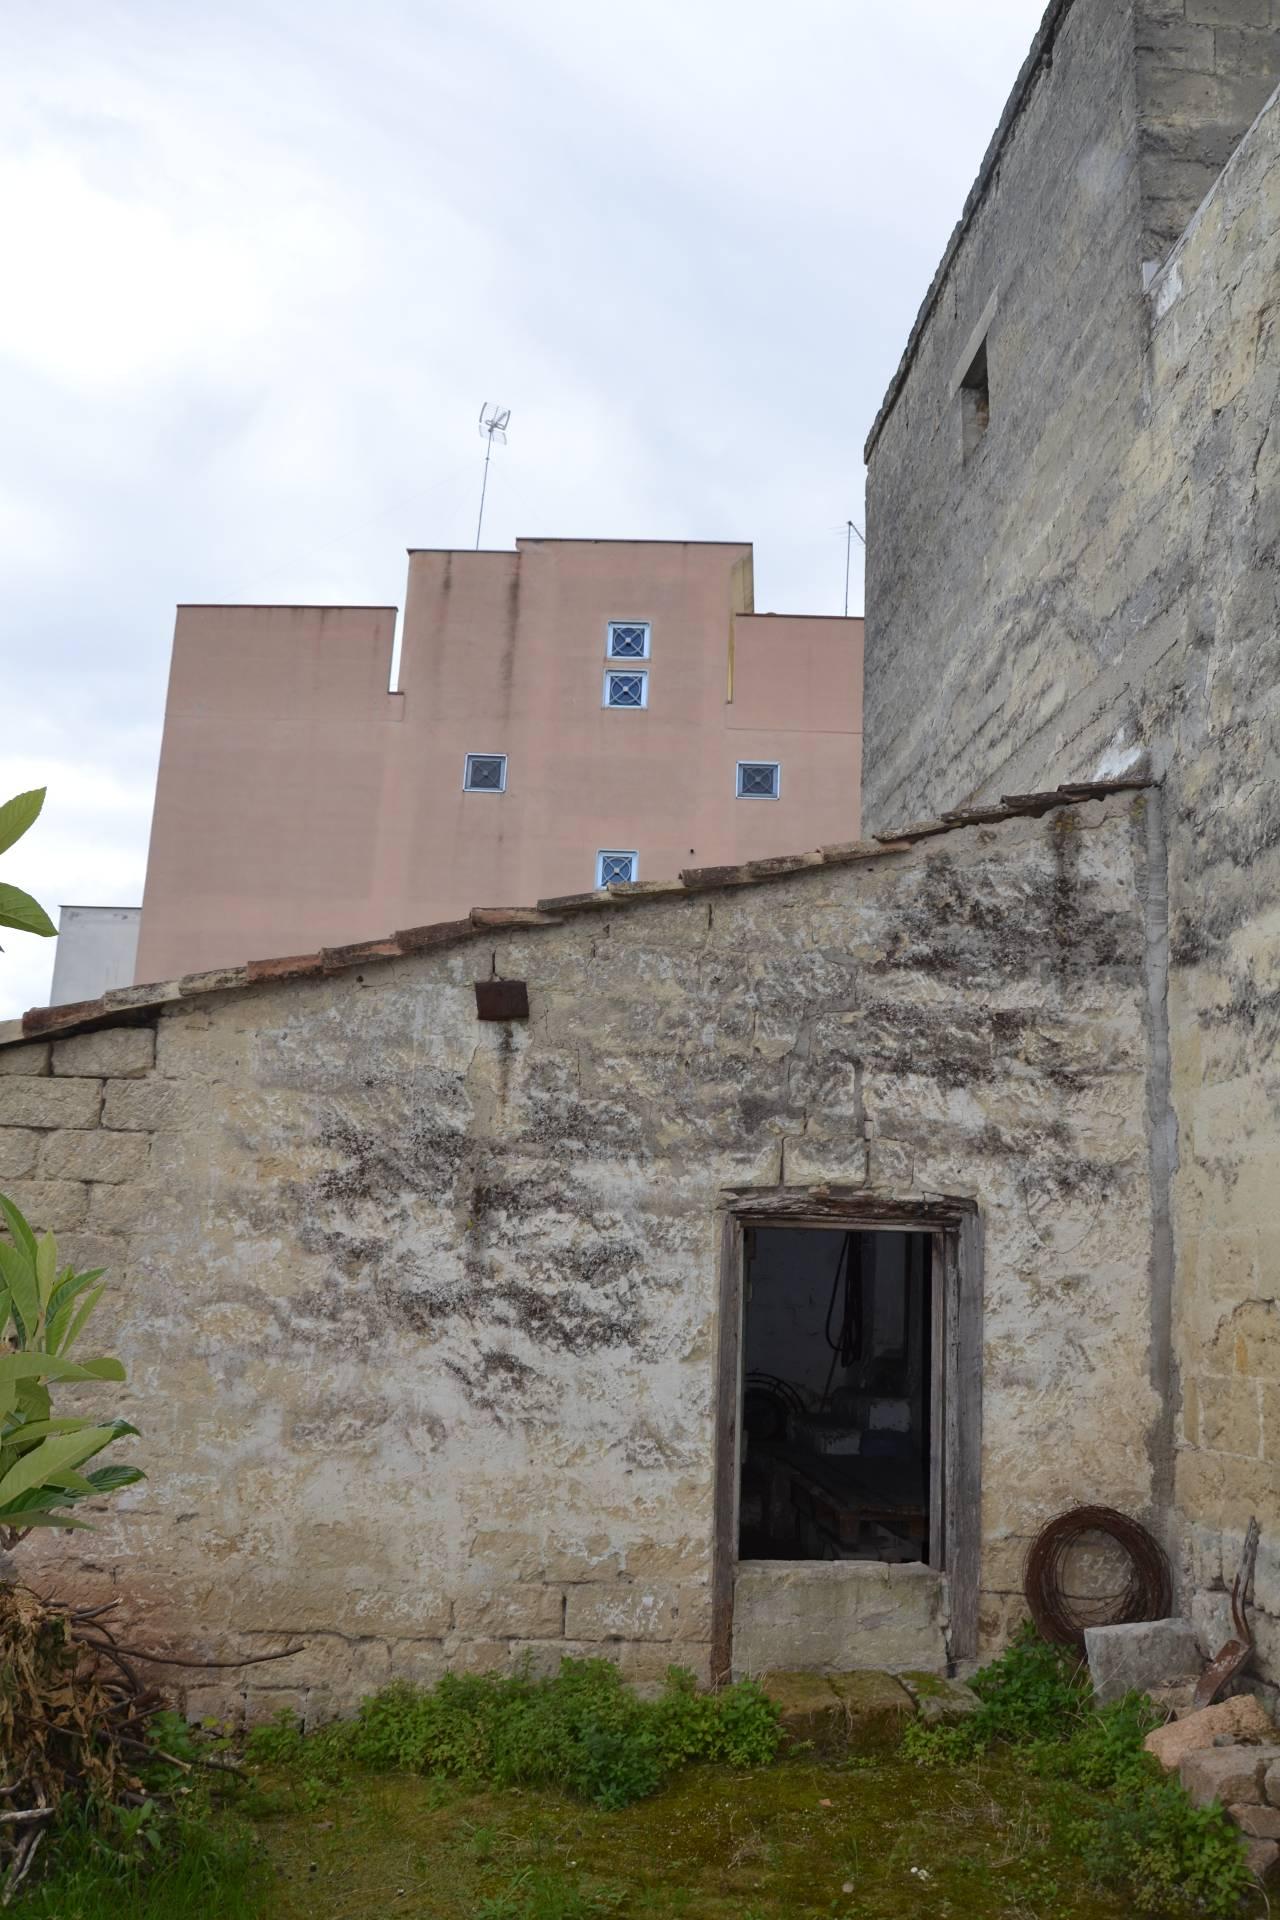 Casa singola in vendita a canosa di puglia cod r410 - Piano casa regione puglia ...